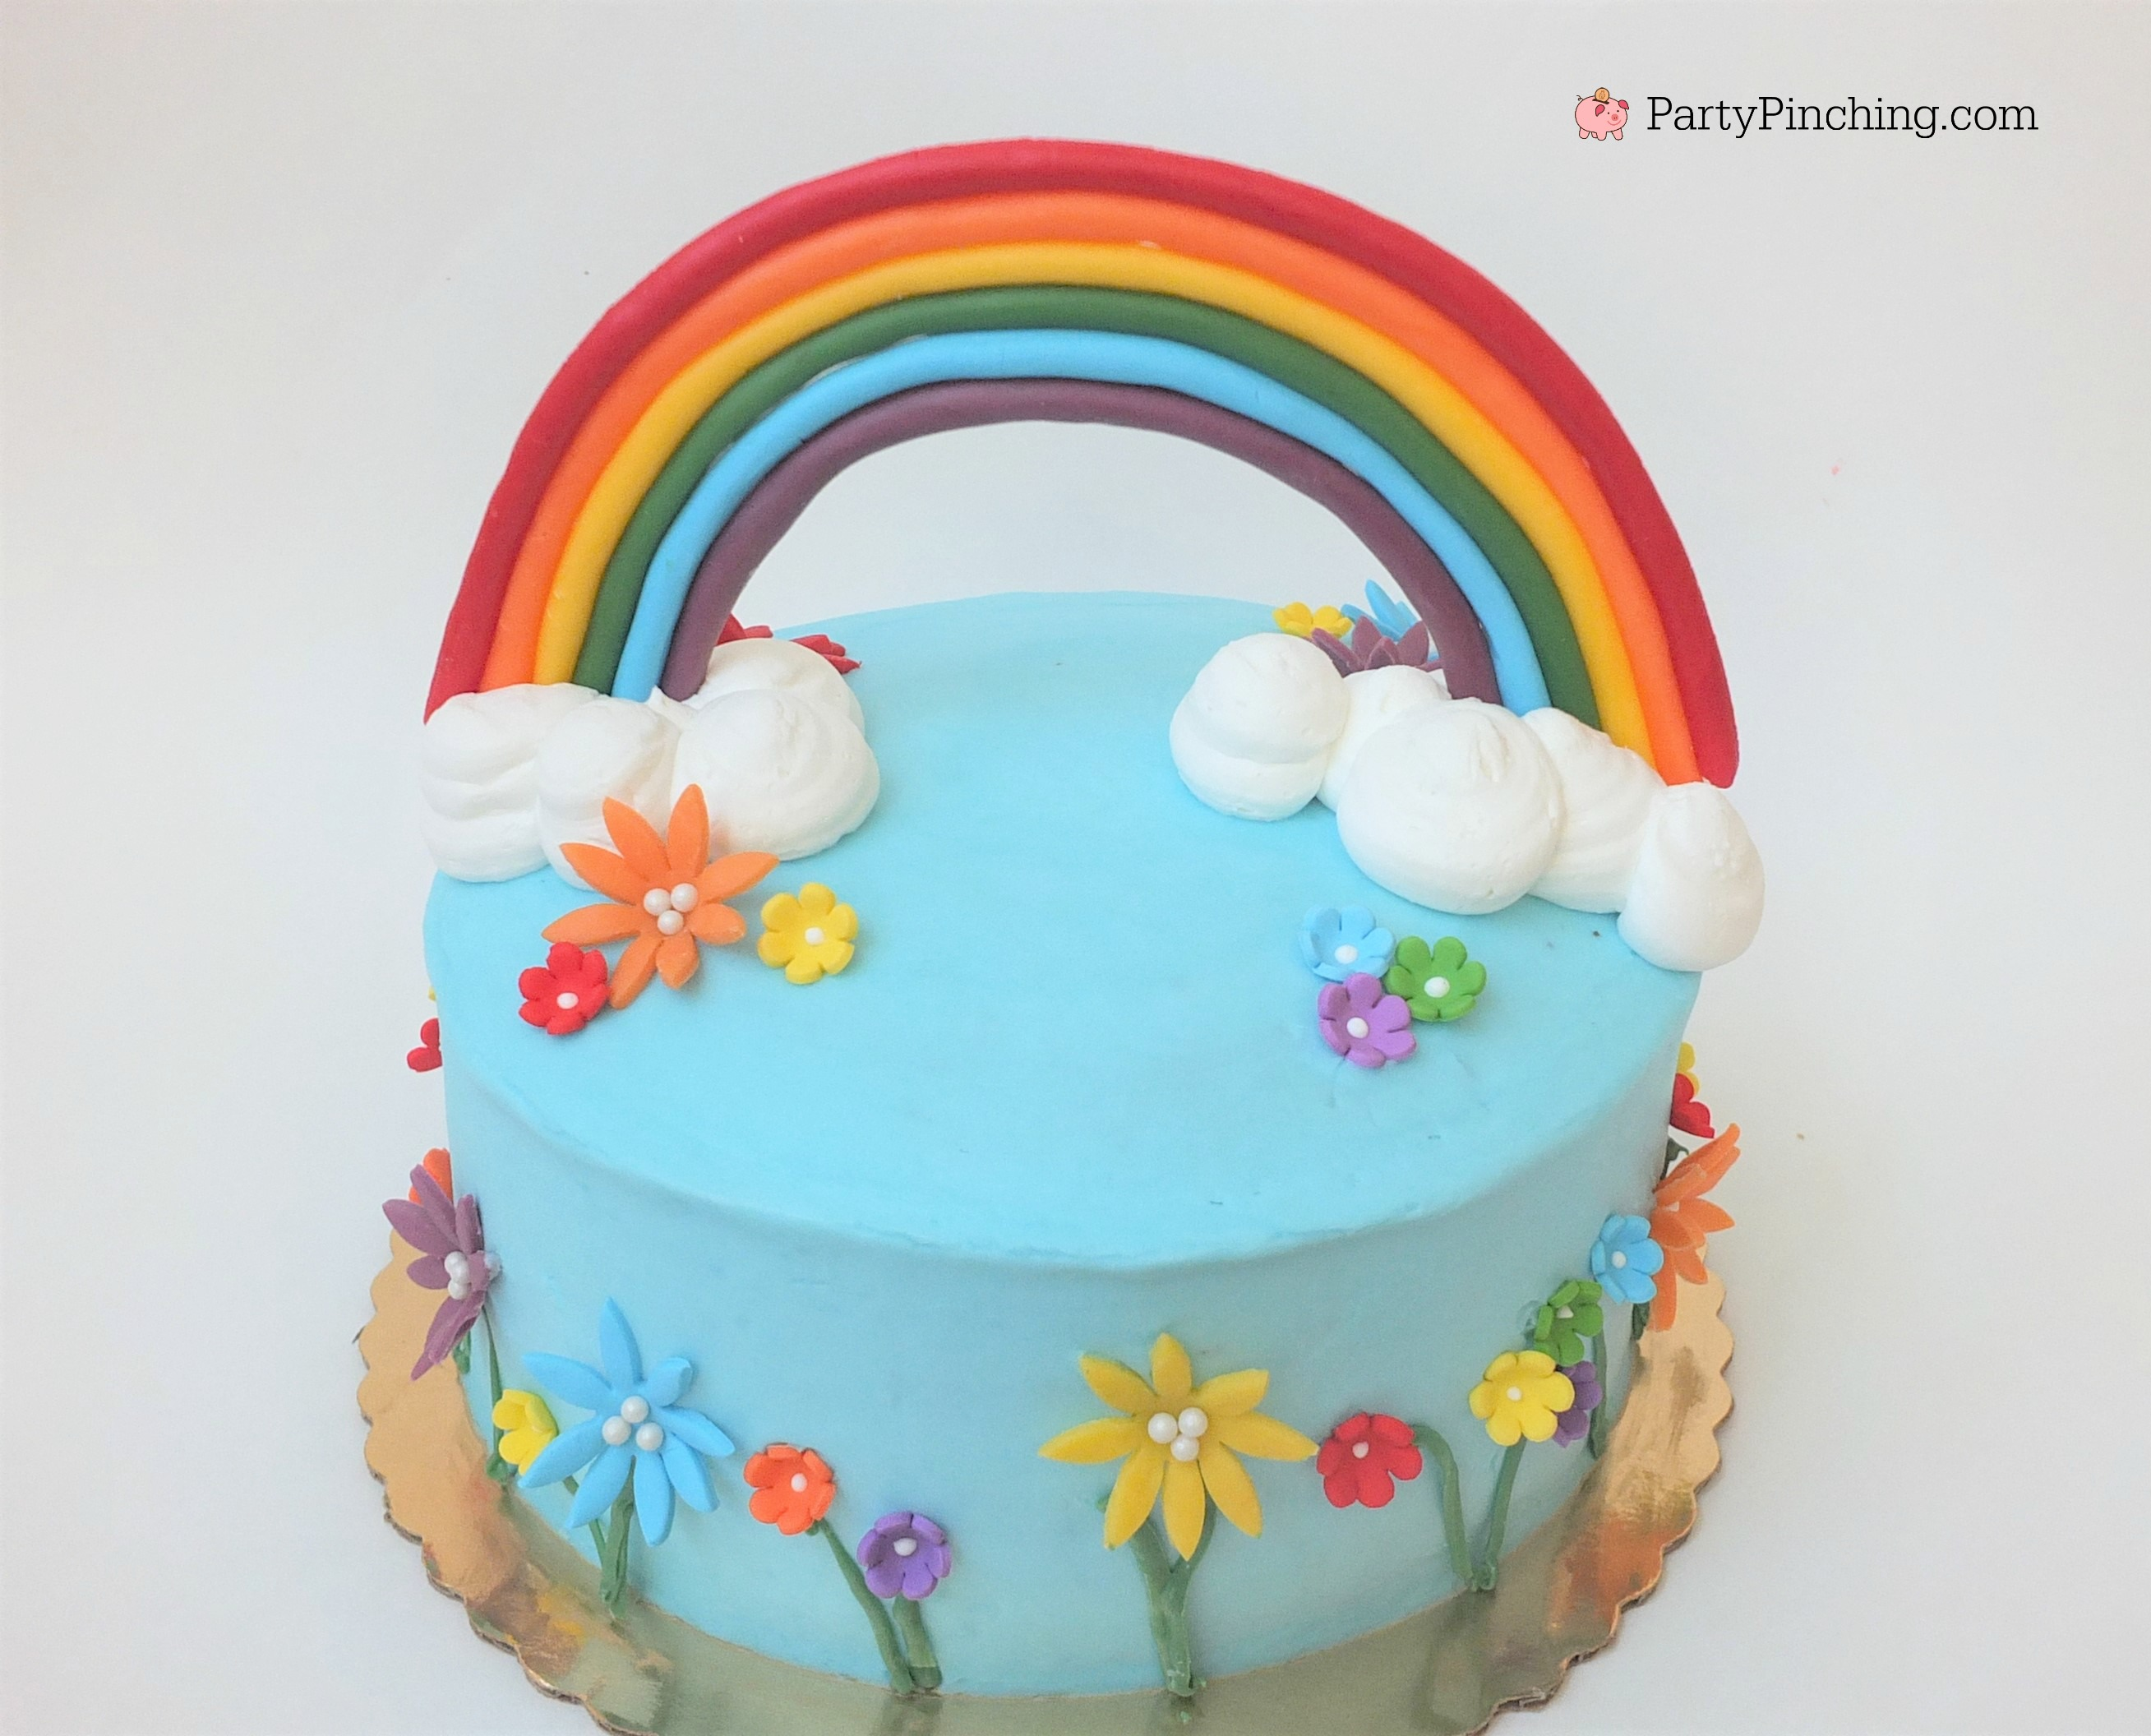 rainbow cake, pretty rainbow cake, candy clay rainbow cake, spring flowers rainbow cake, St. Patrick's Day rainbow cake